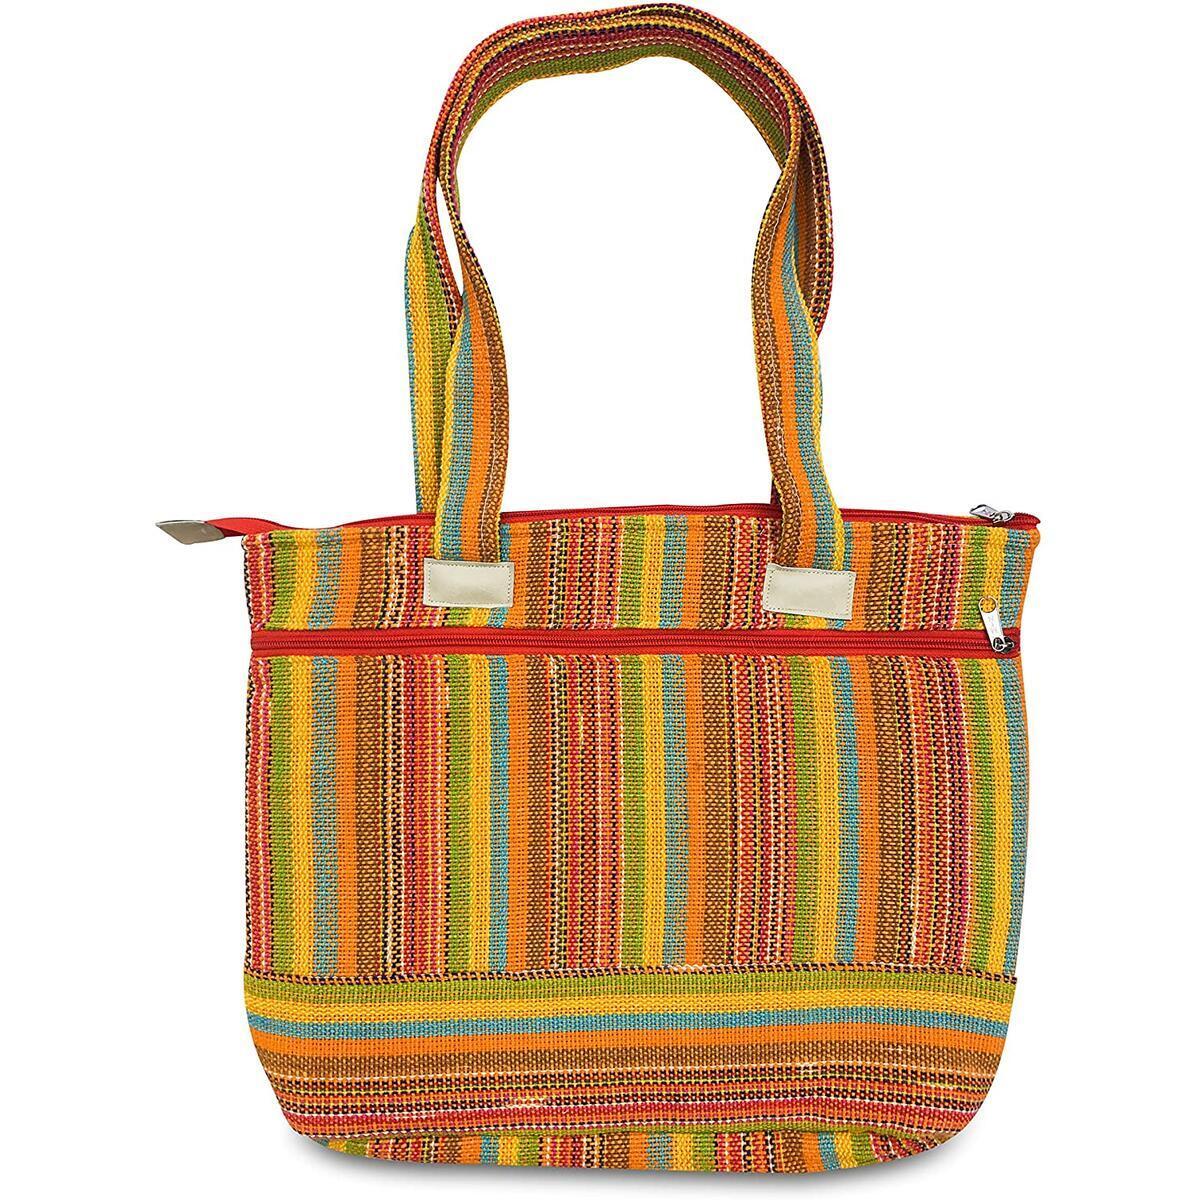 Colorful Handmade Bag - Cotton Shoulder Bag - Boho Hippie Bag For Women - Lightweight, Durable Handbag for Tablet, Laptop, Books, Wallets - Casual Boho Style Satchel for Travel, Work, School